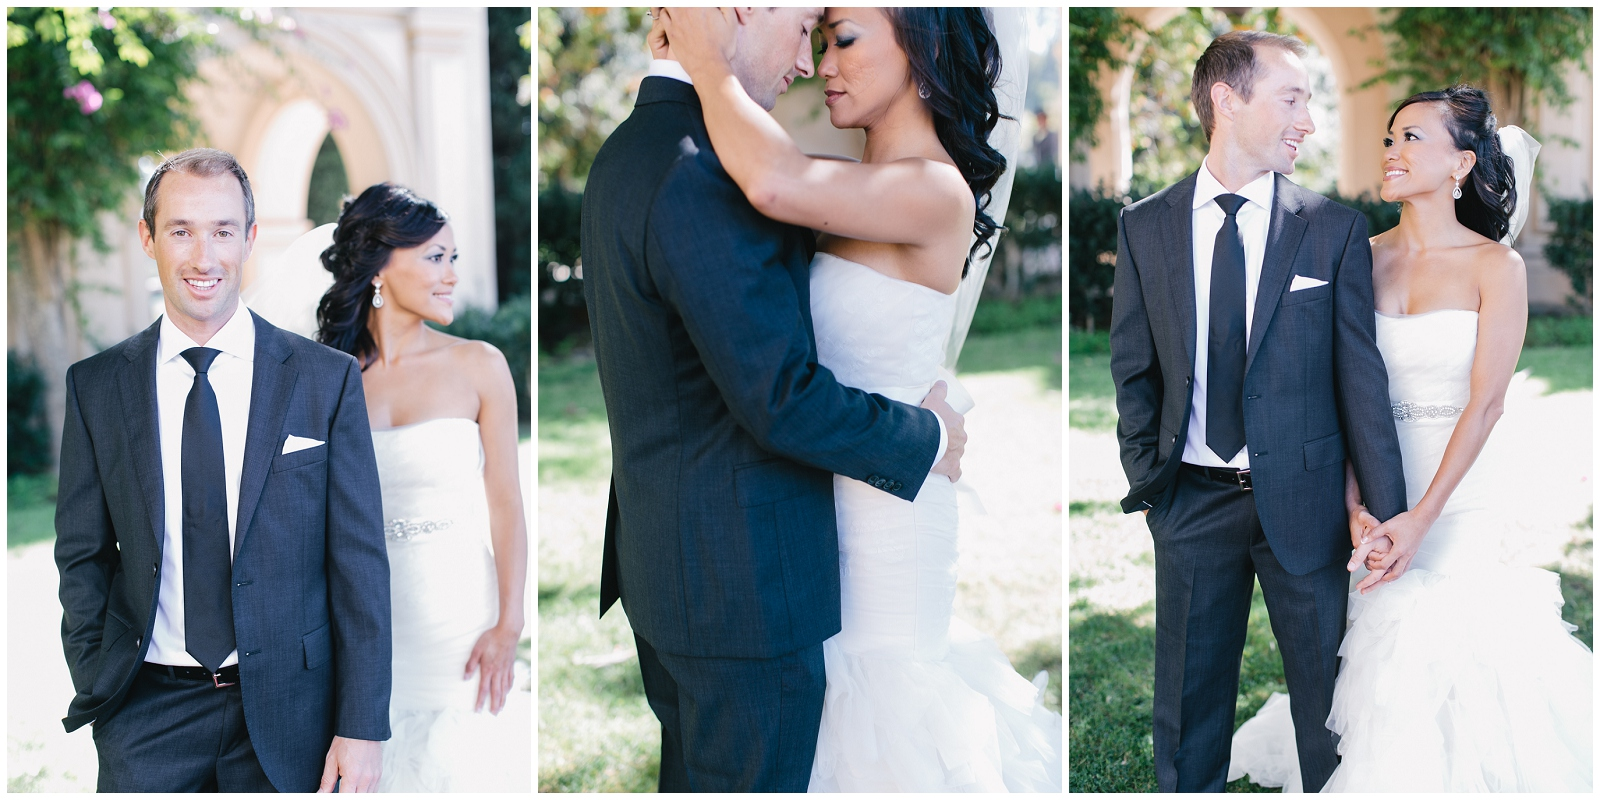 San-Francisco-Bay-Area-Wedding-Photography-Destination-16.jpg